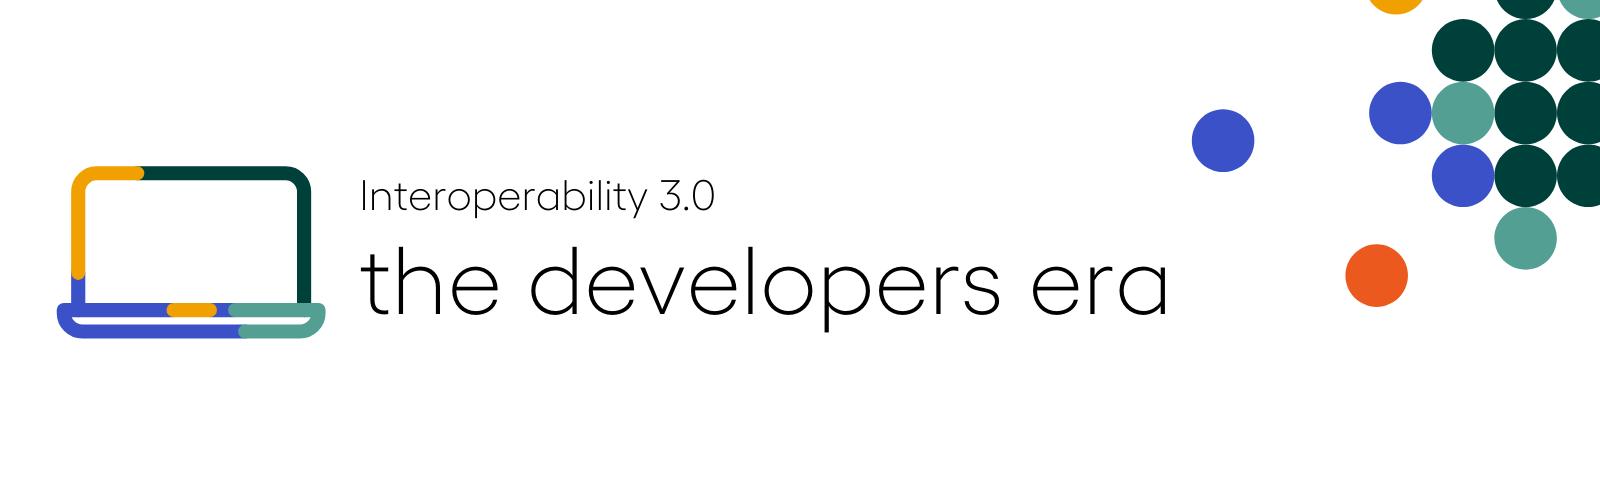 interoperability 3.0